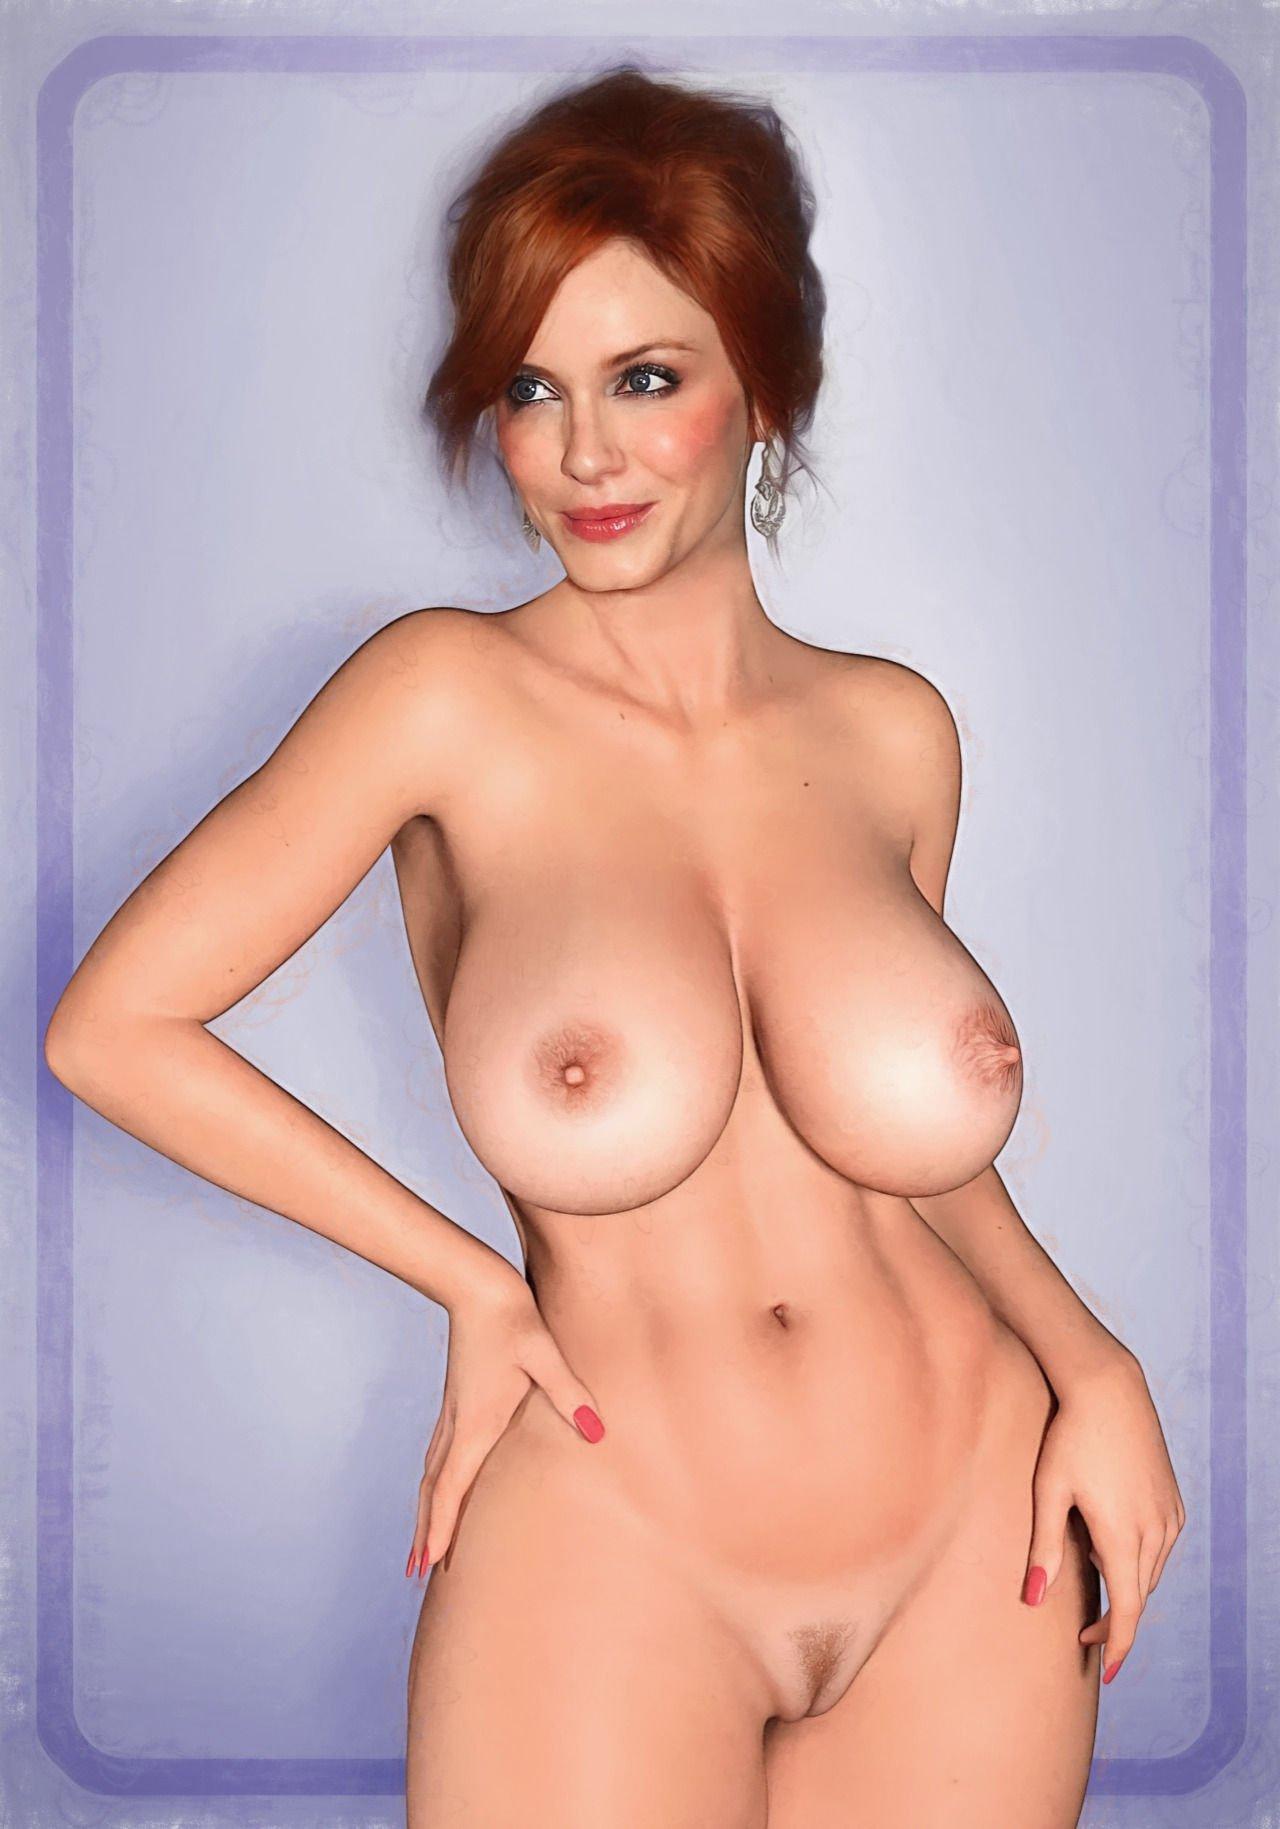 Christina hendricks topless — photo 5